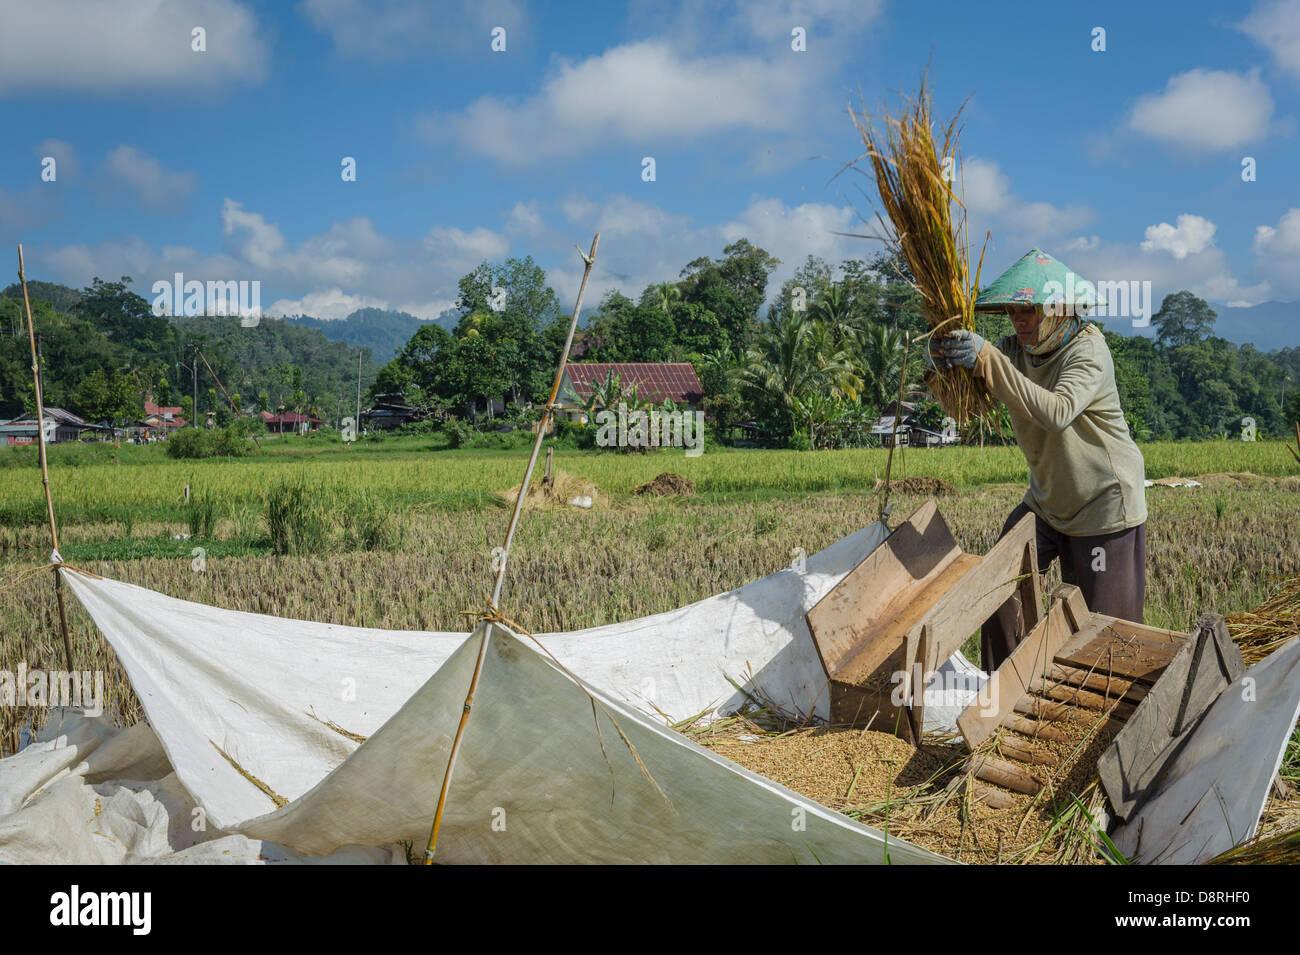 Woman threshing rice by hand, Tana Toraja, Sulawesi, Indonesia, Asia - Stock Image